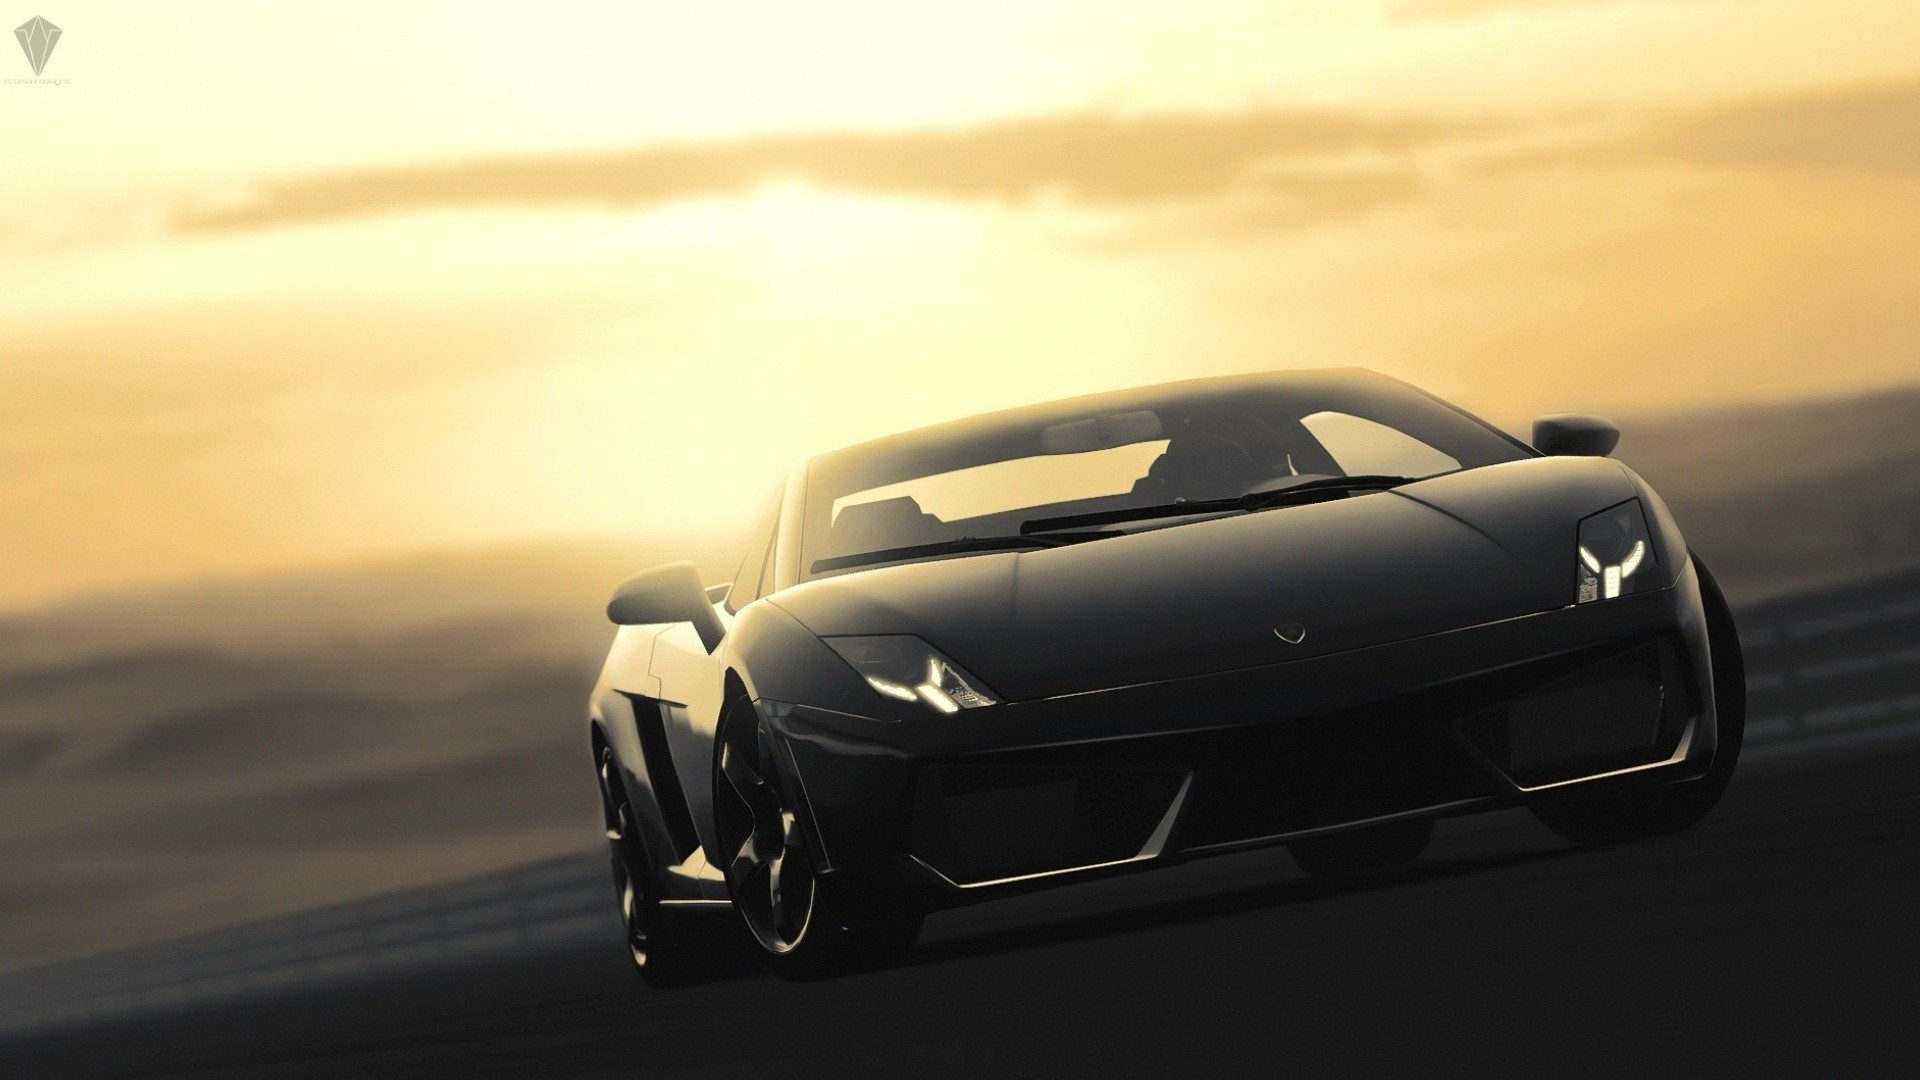 Lamborghini Gallardo Full HD Wallpaper and Background Image ...